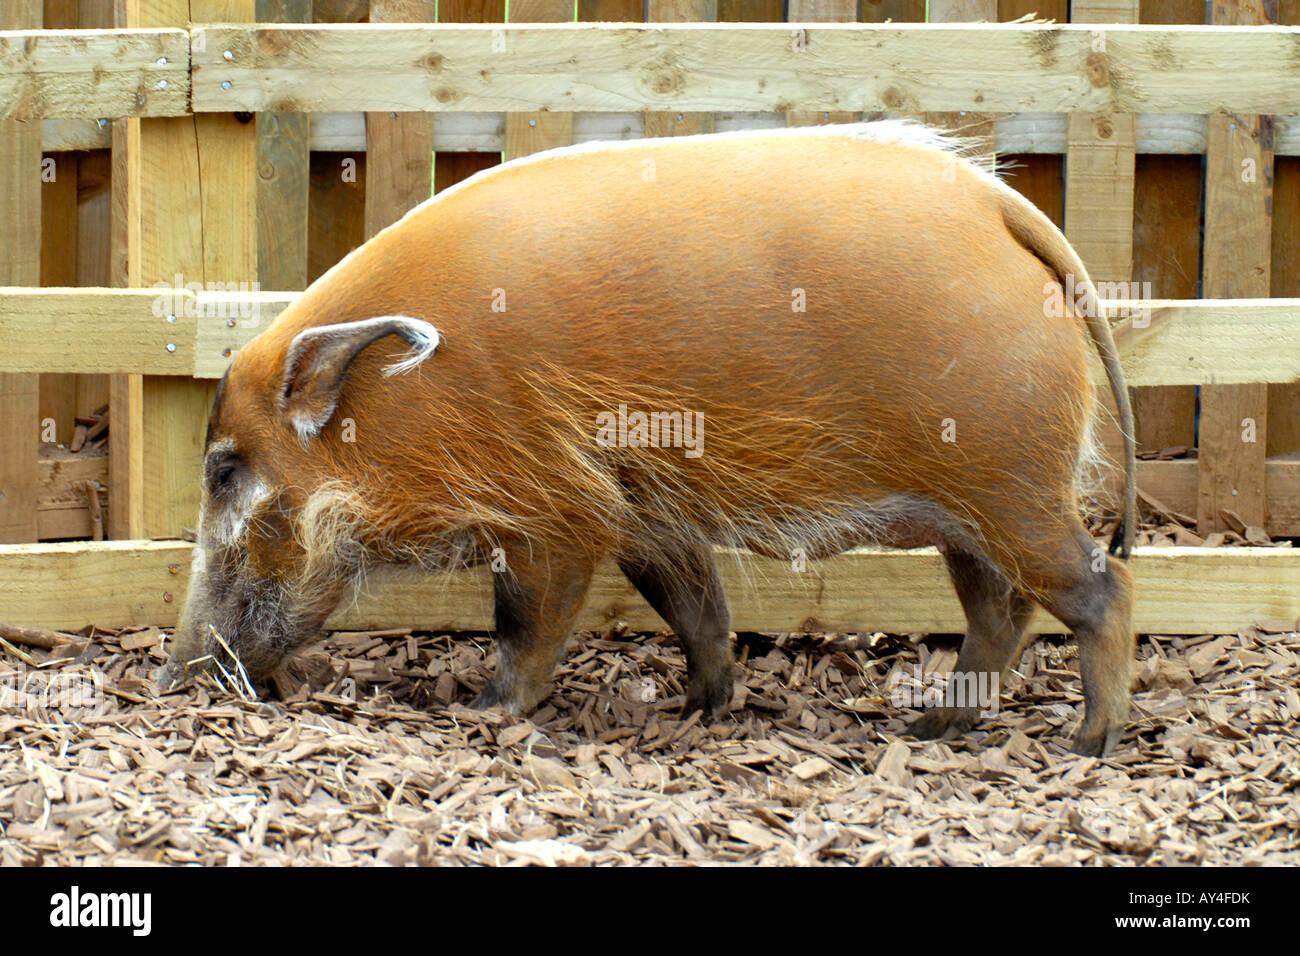 woburn safari park , exotic hairy pig stock photo: 16989774 - alamy